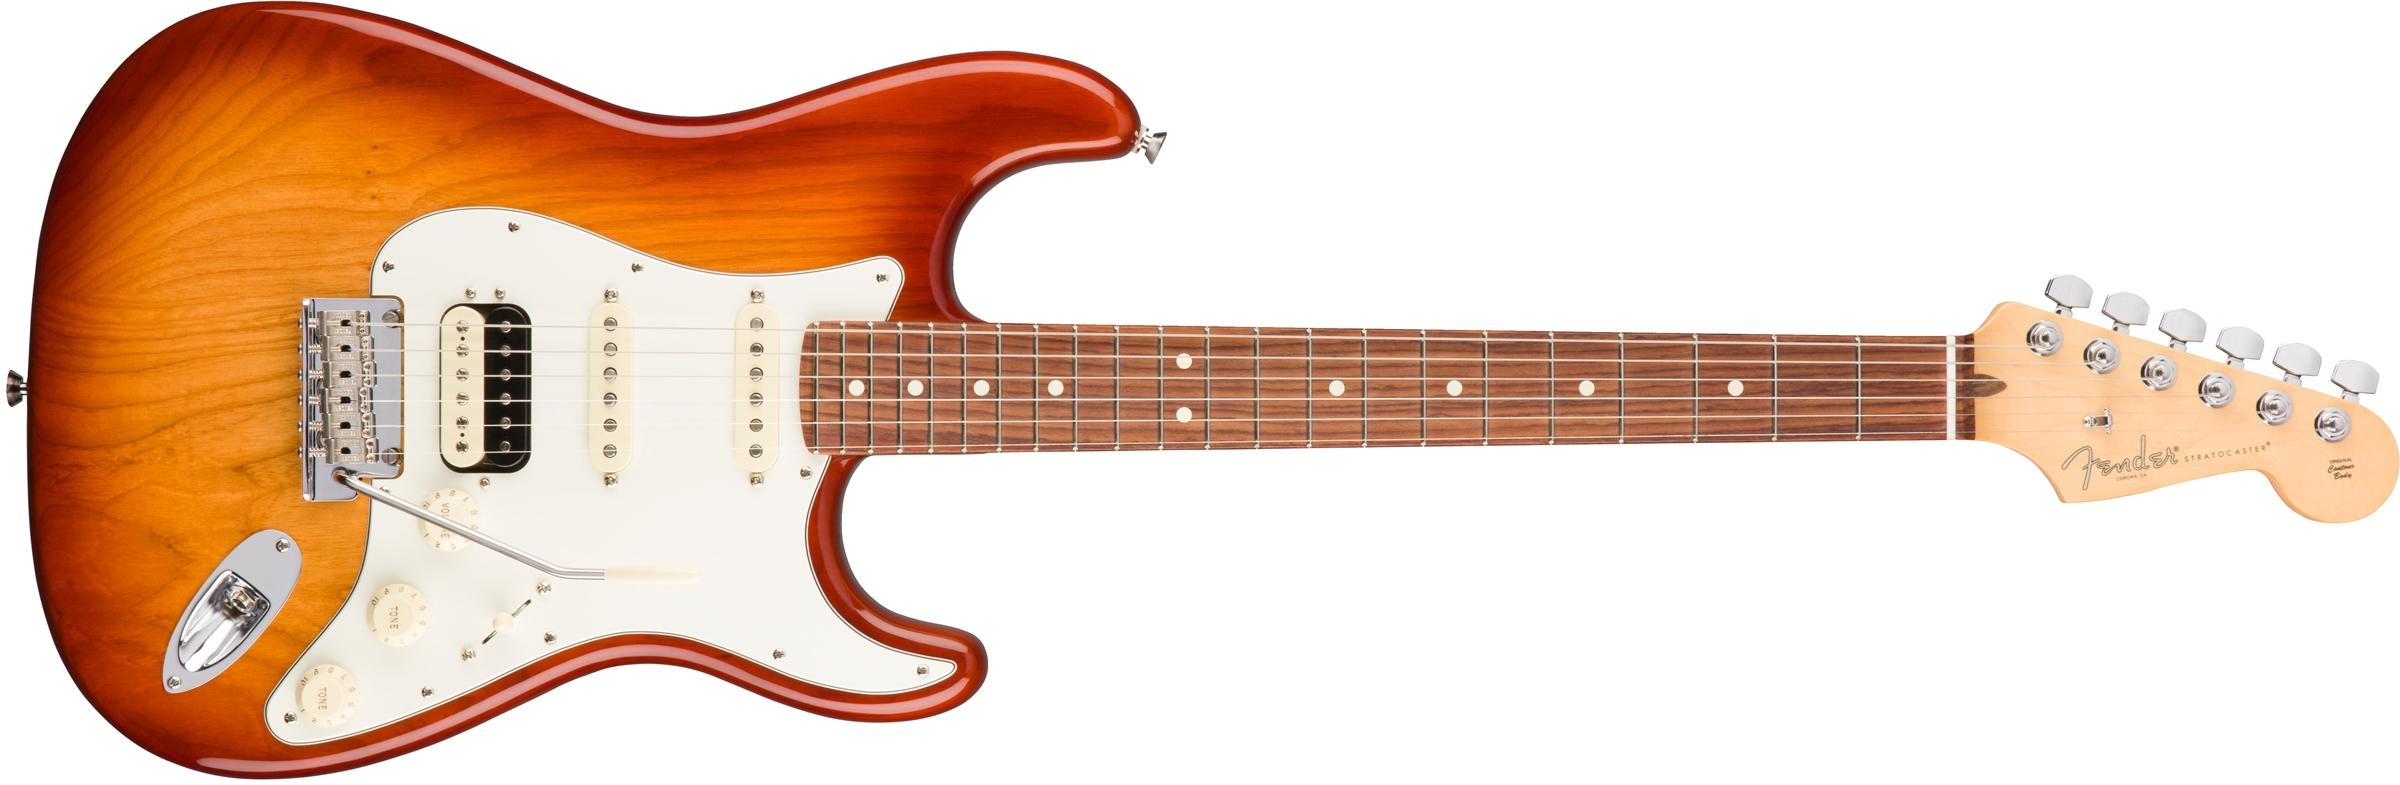 FENDER American Pro Stratocaster HSS ShawBucker RW Sienna Sunburst 0113040747